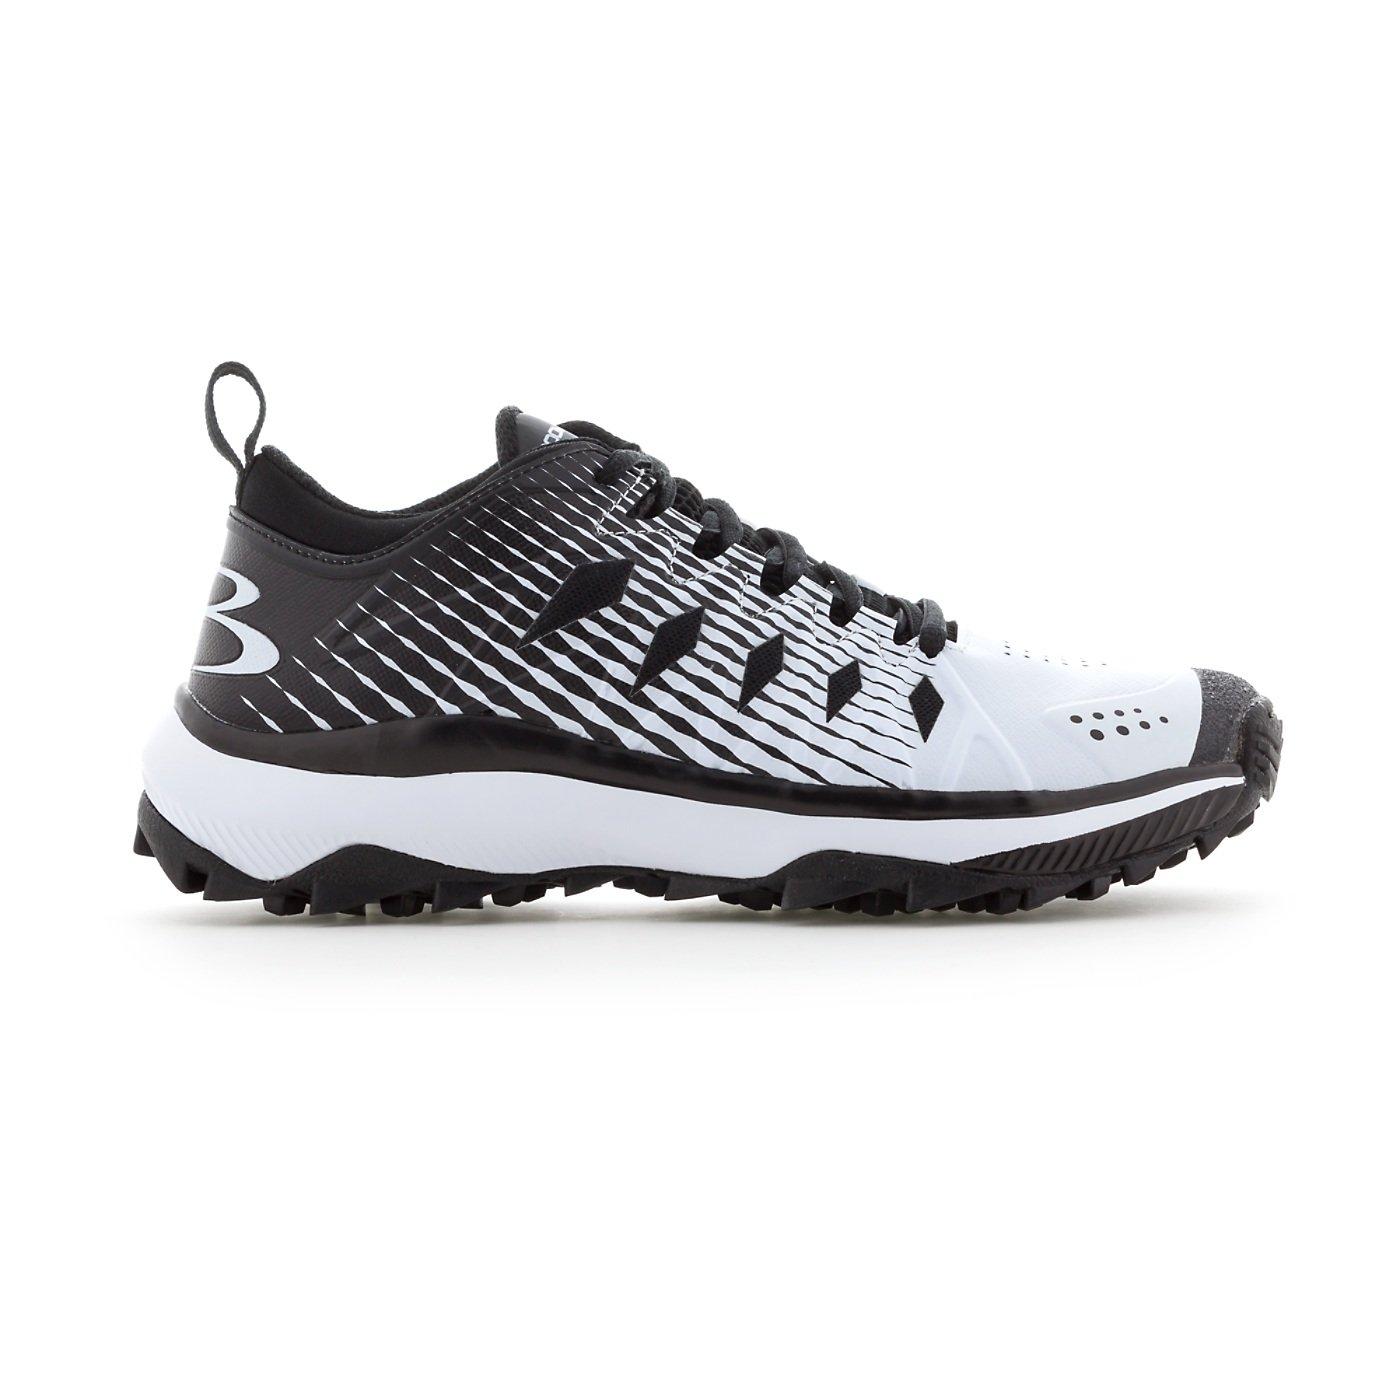 Boombah Women's Squadron Turf Shoes - 14 Color Options - Multiple Sizes B079K4DXHD 6 Black/White